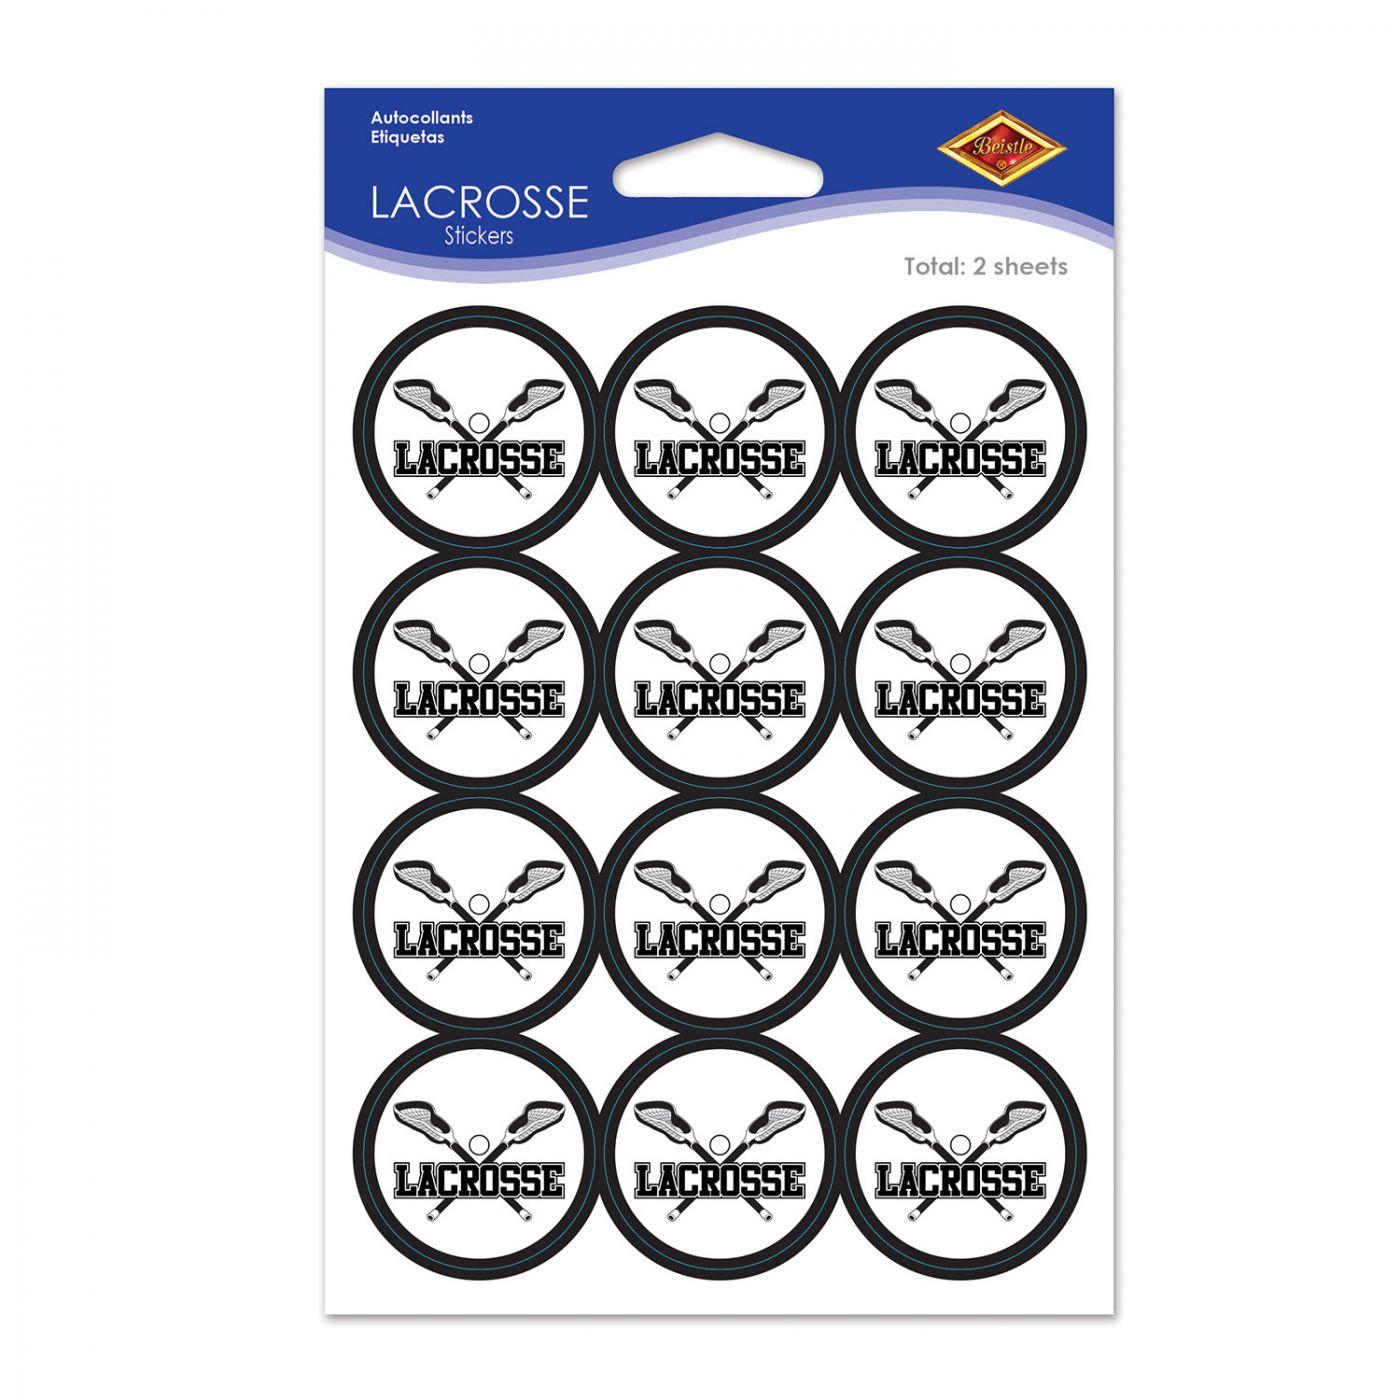 Lacrosse Stickers image